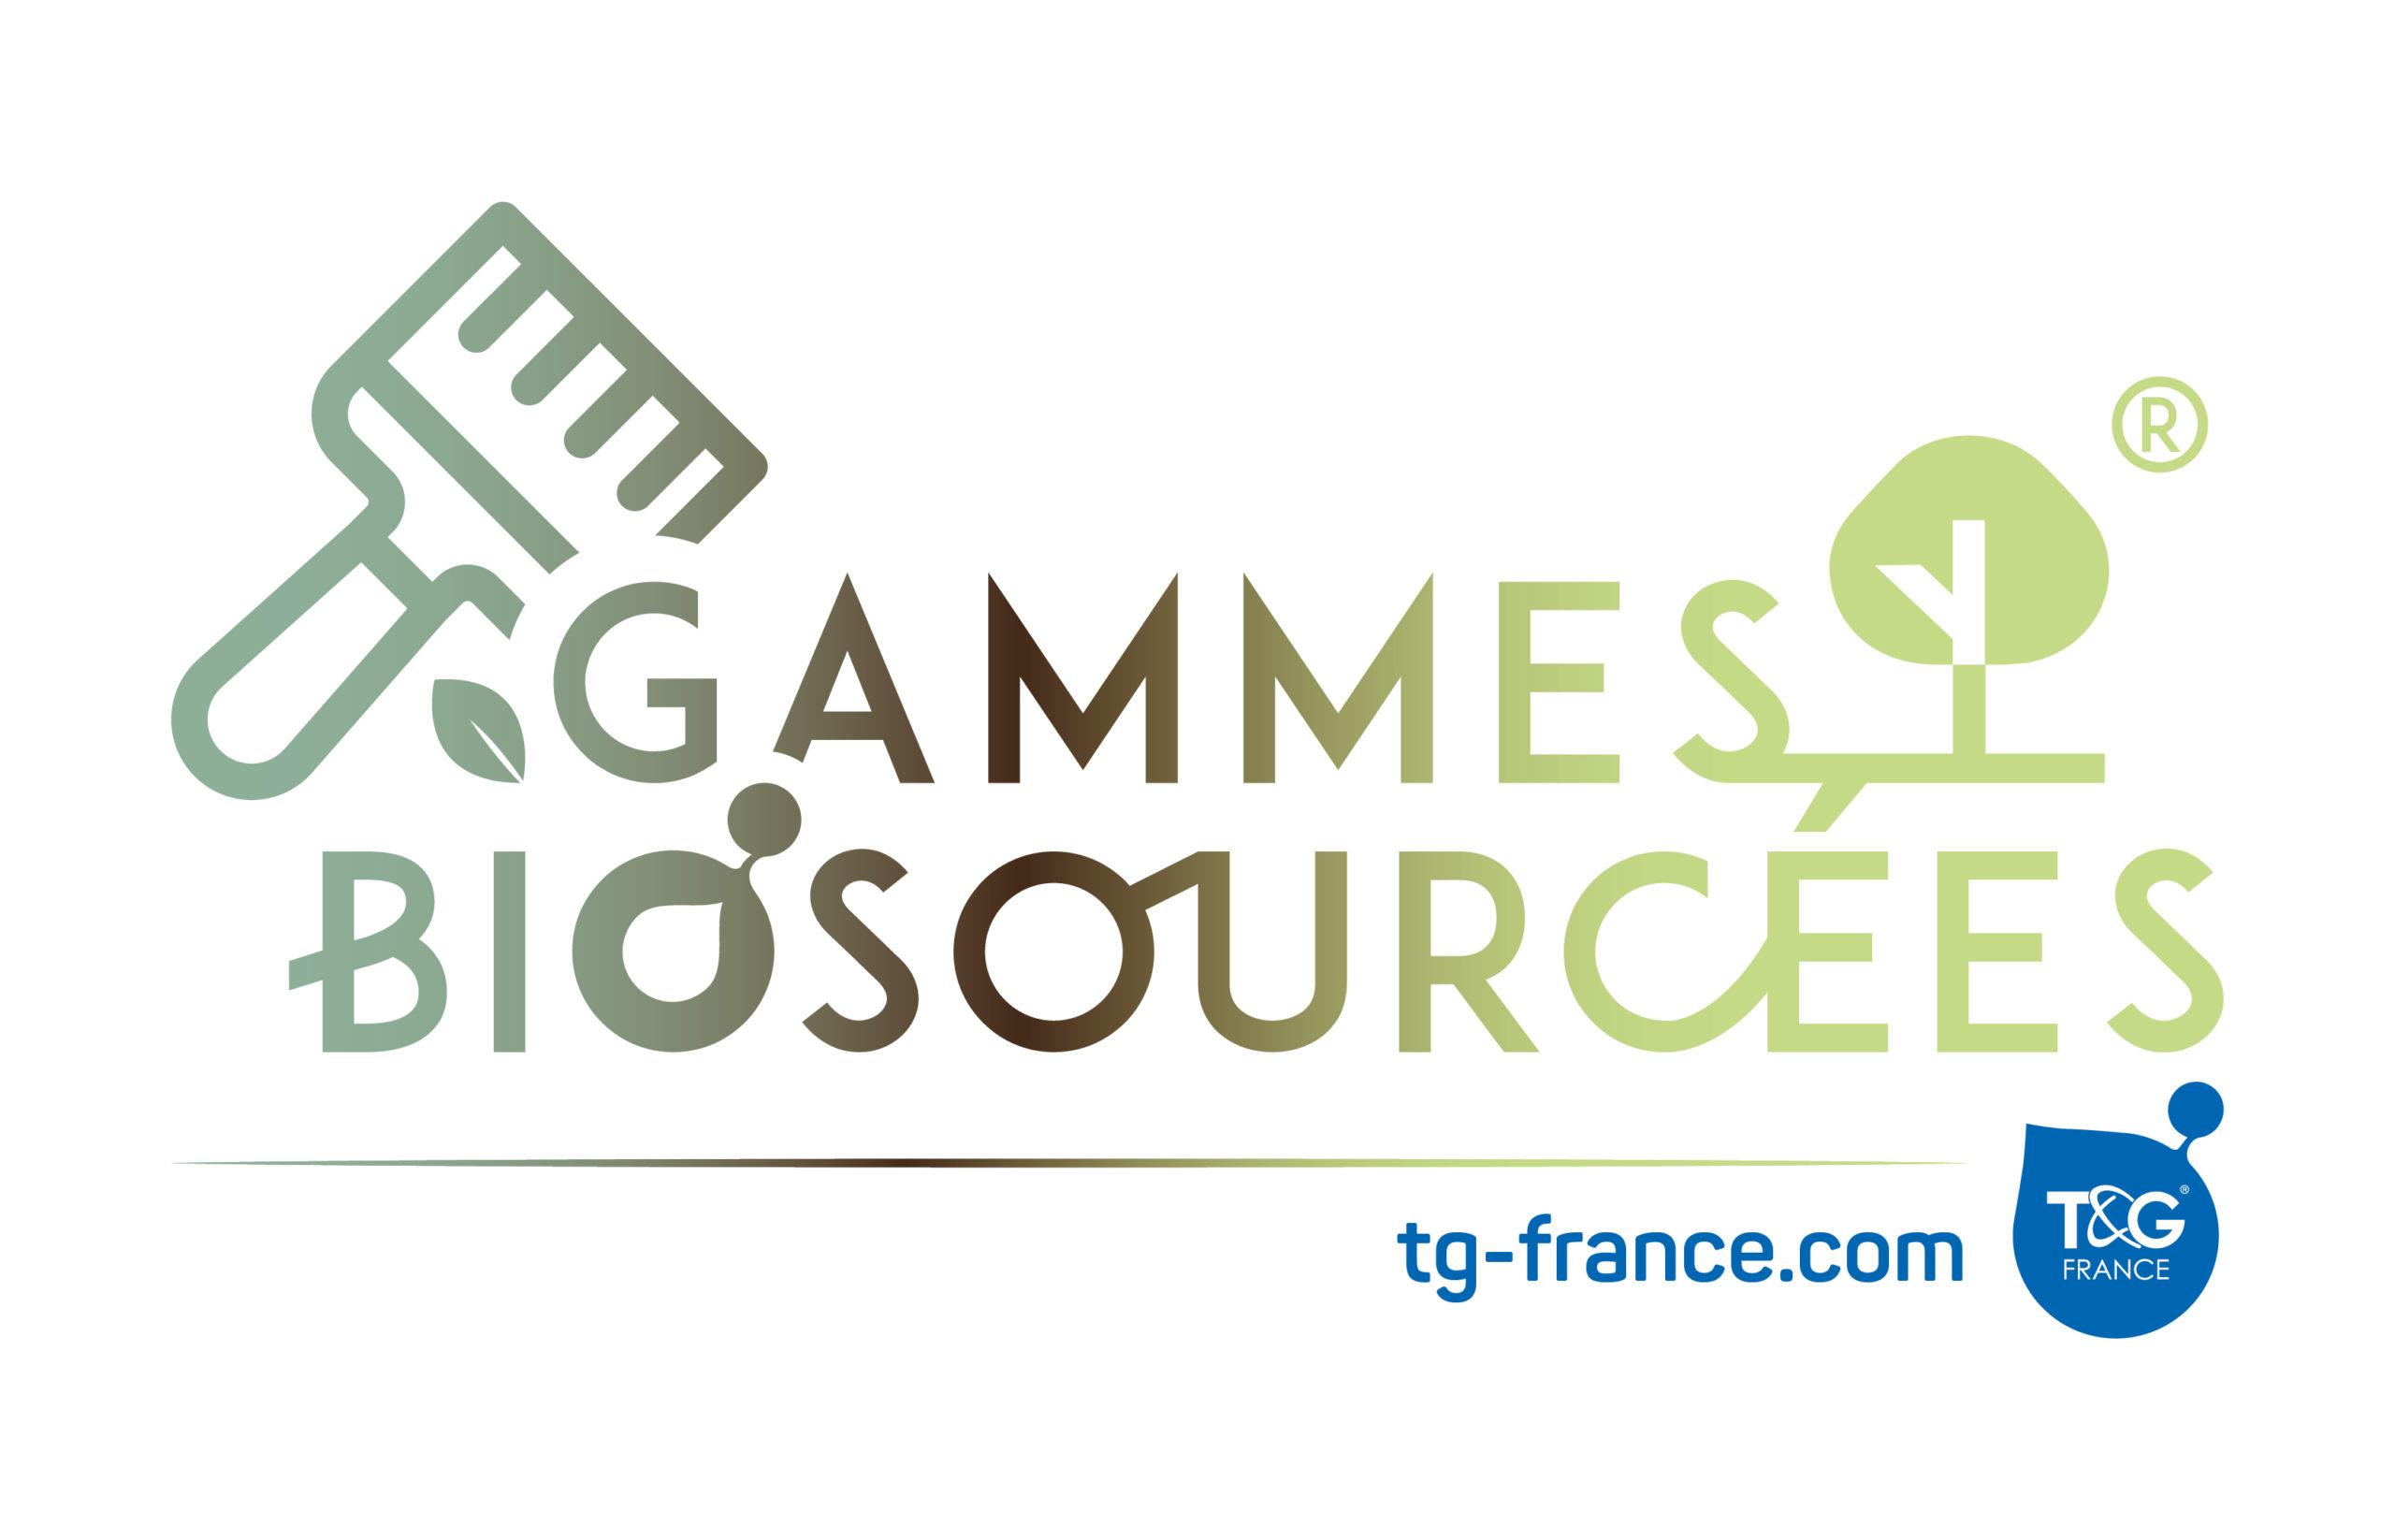 T&G_TAG_GAMMES-BIOSOURCEES+LOGO